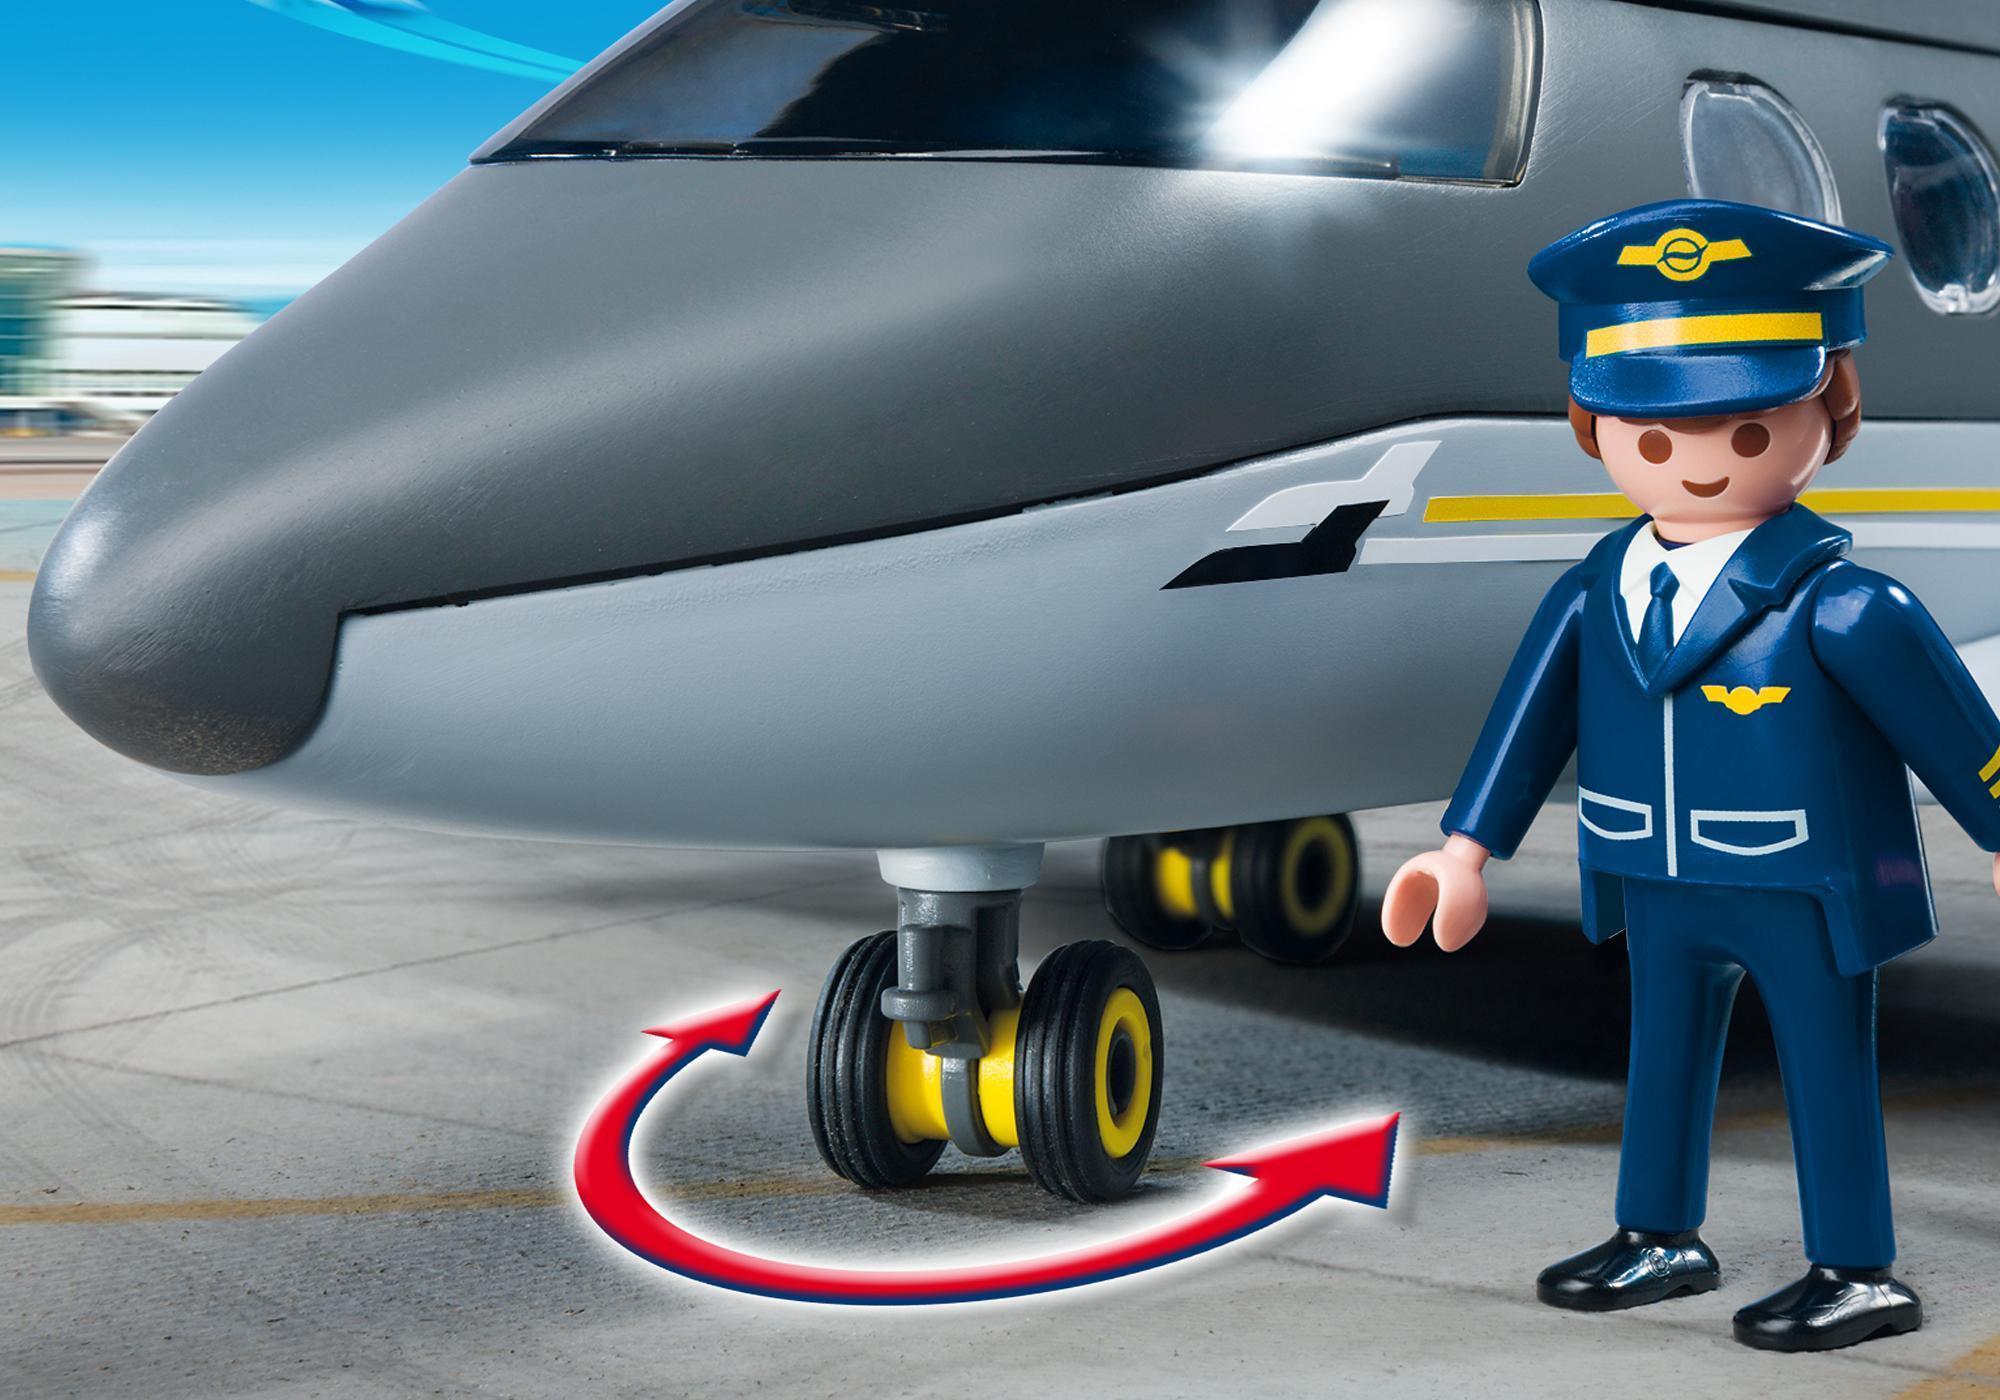 http://media.playmobil.com/i/playmobil/5619_product_extra3/Plane